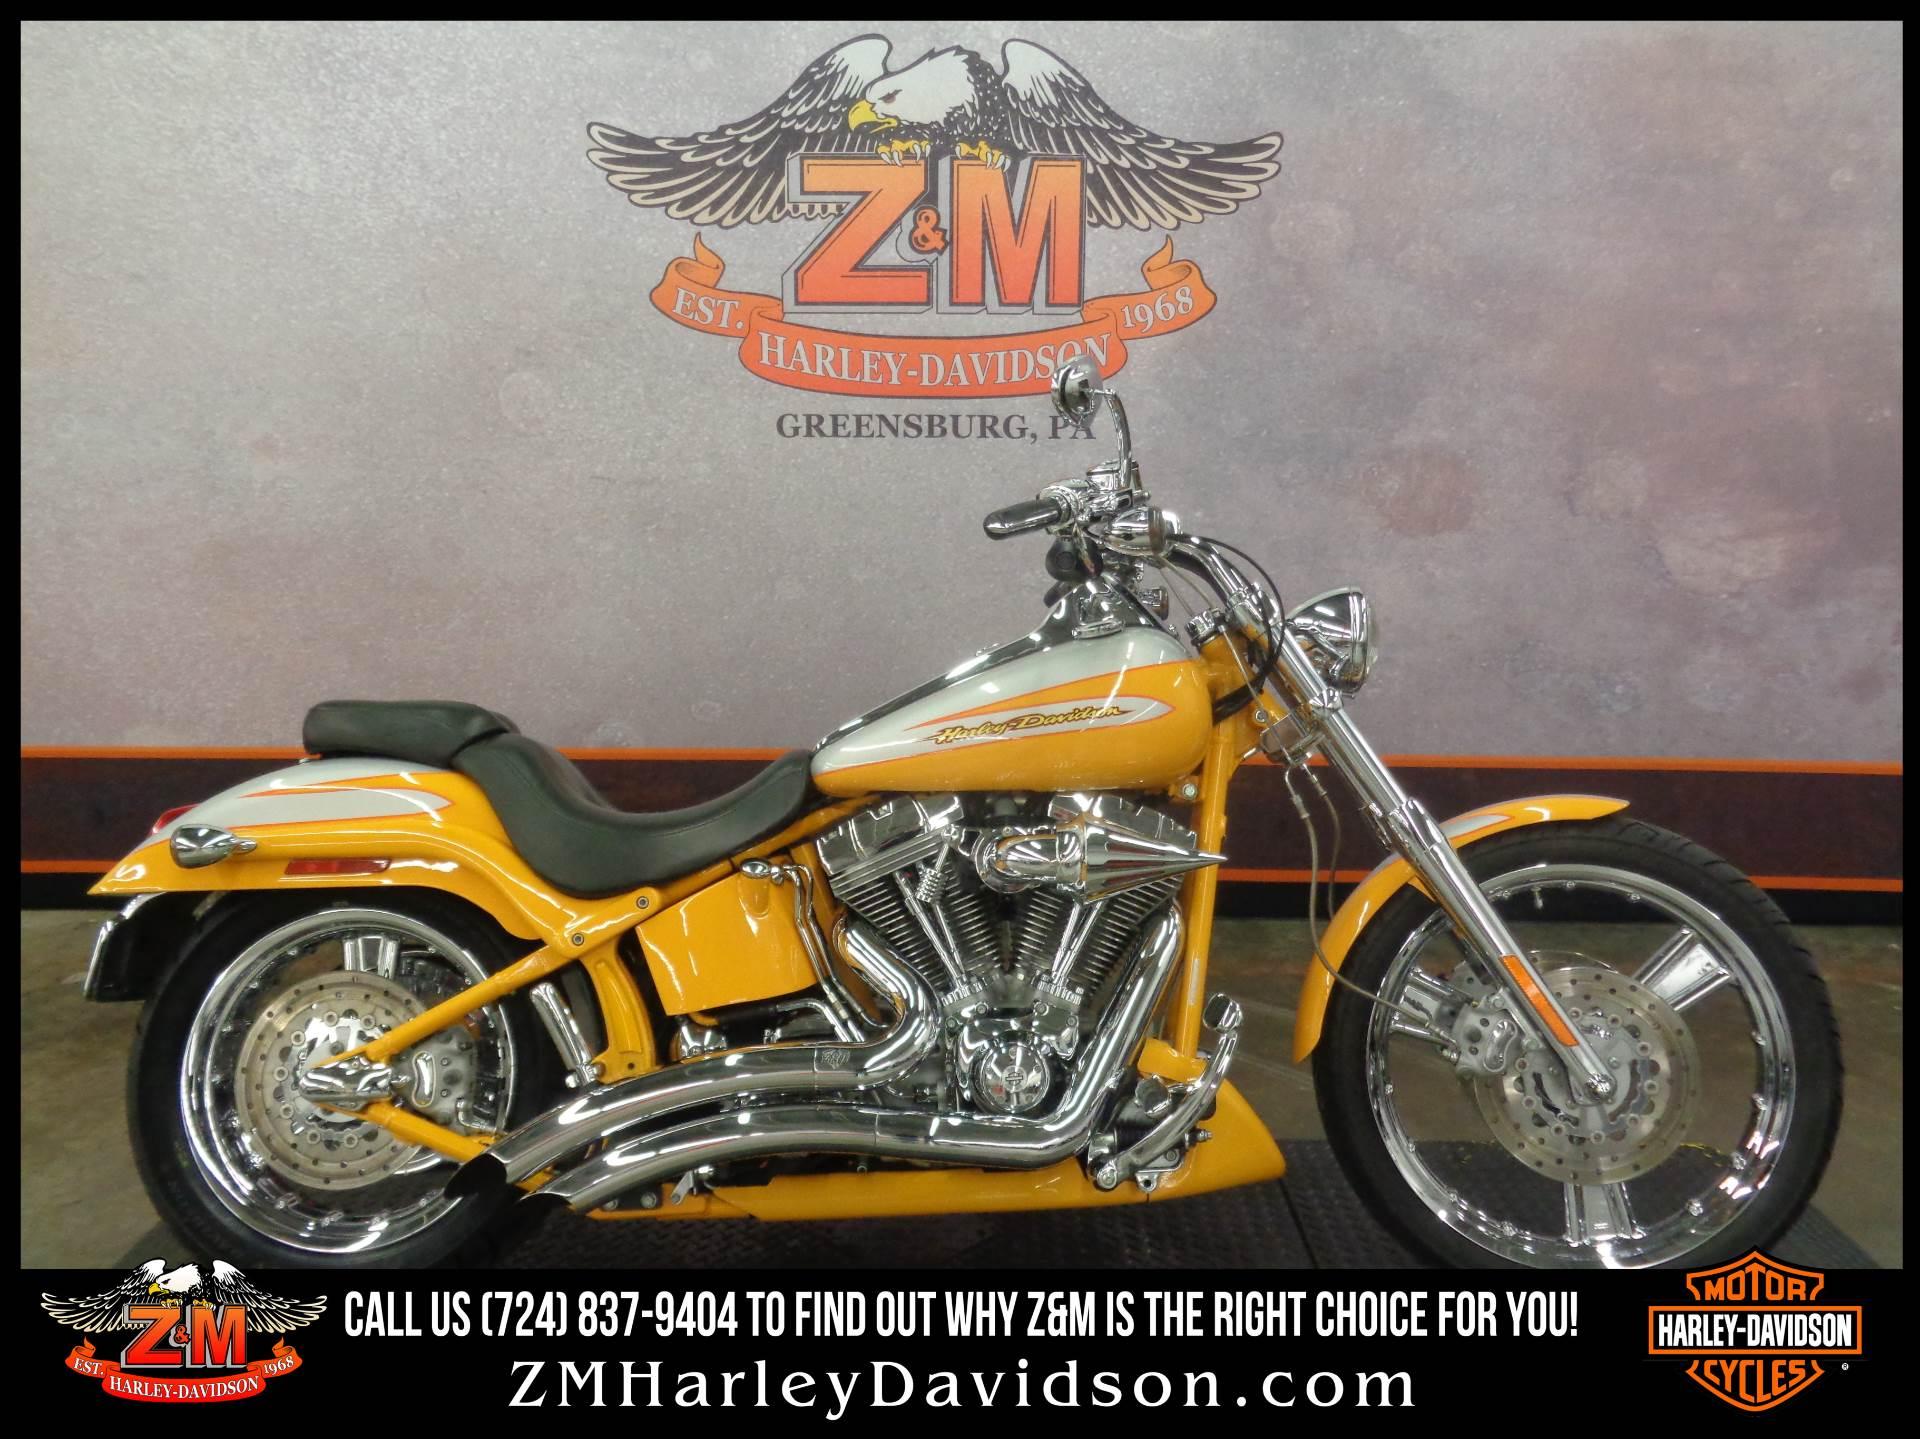 Harley Davidson Deuce >> 2004 Harley Davidson Fxstdse Screamin Eagle Softail Deuce In Greensburg Pennsylvania